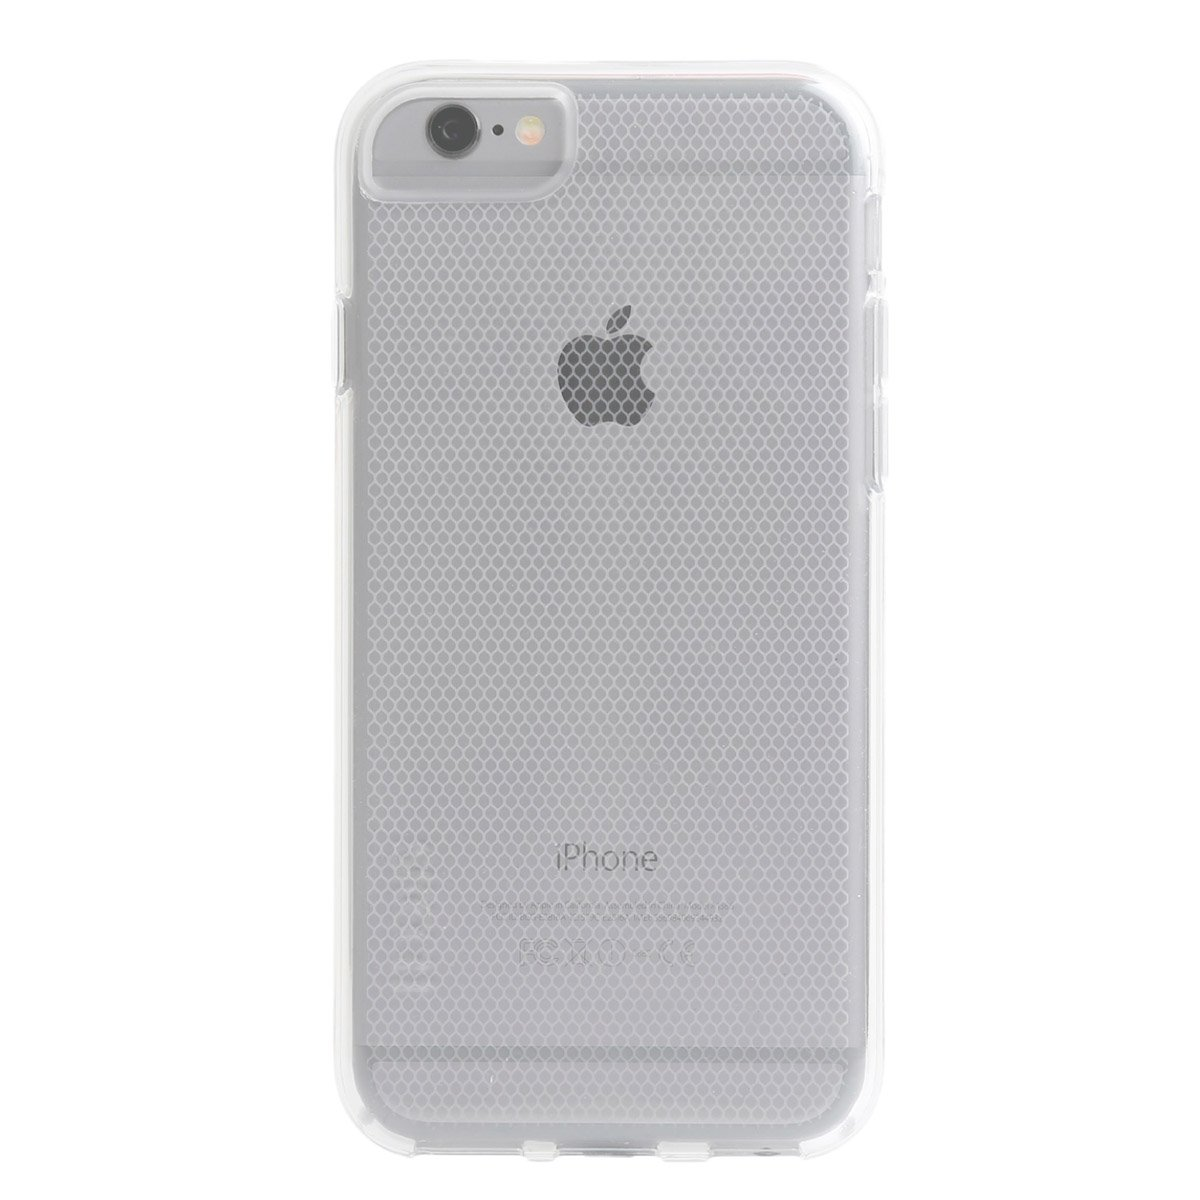 Funda para iphone 7 matrix transparente skech sears com mx me entiende - Fundas cargadoras para iphone ...